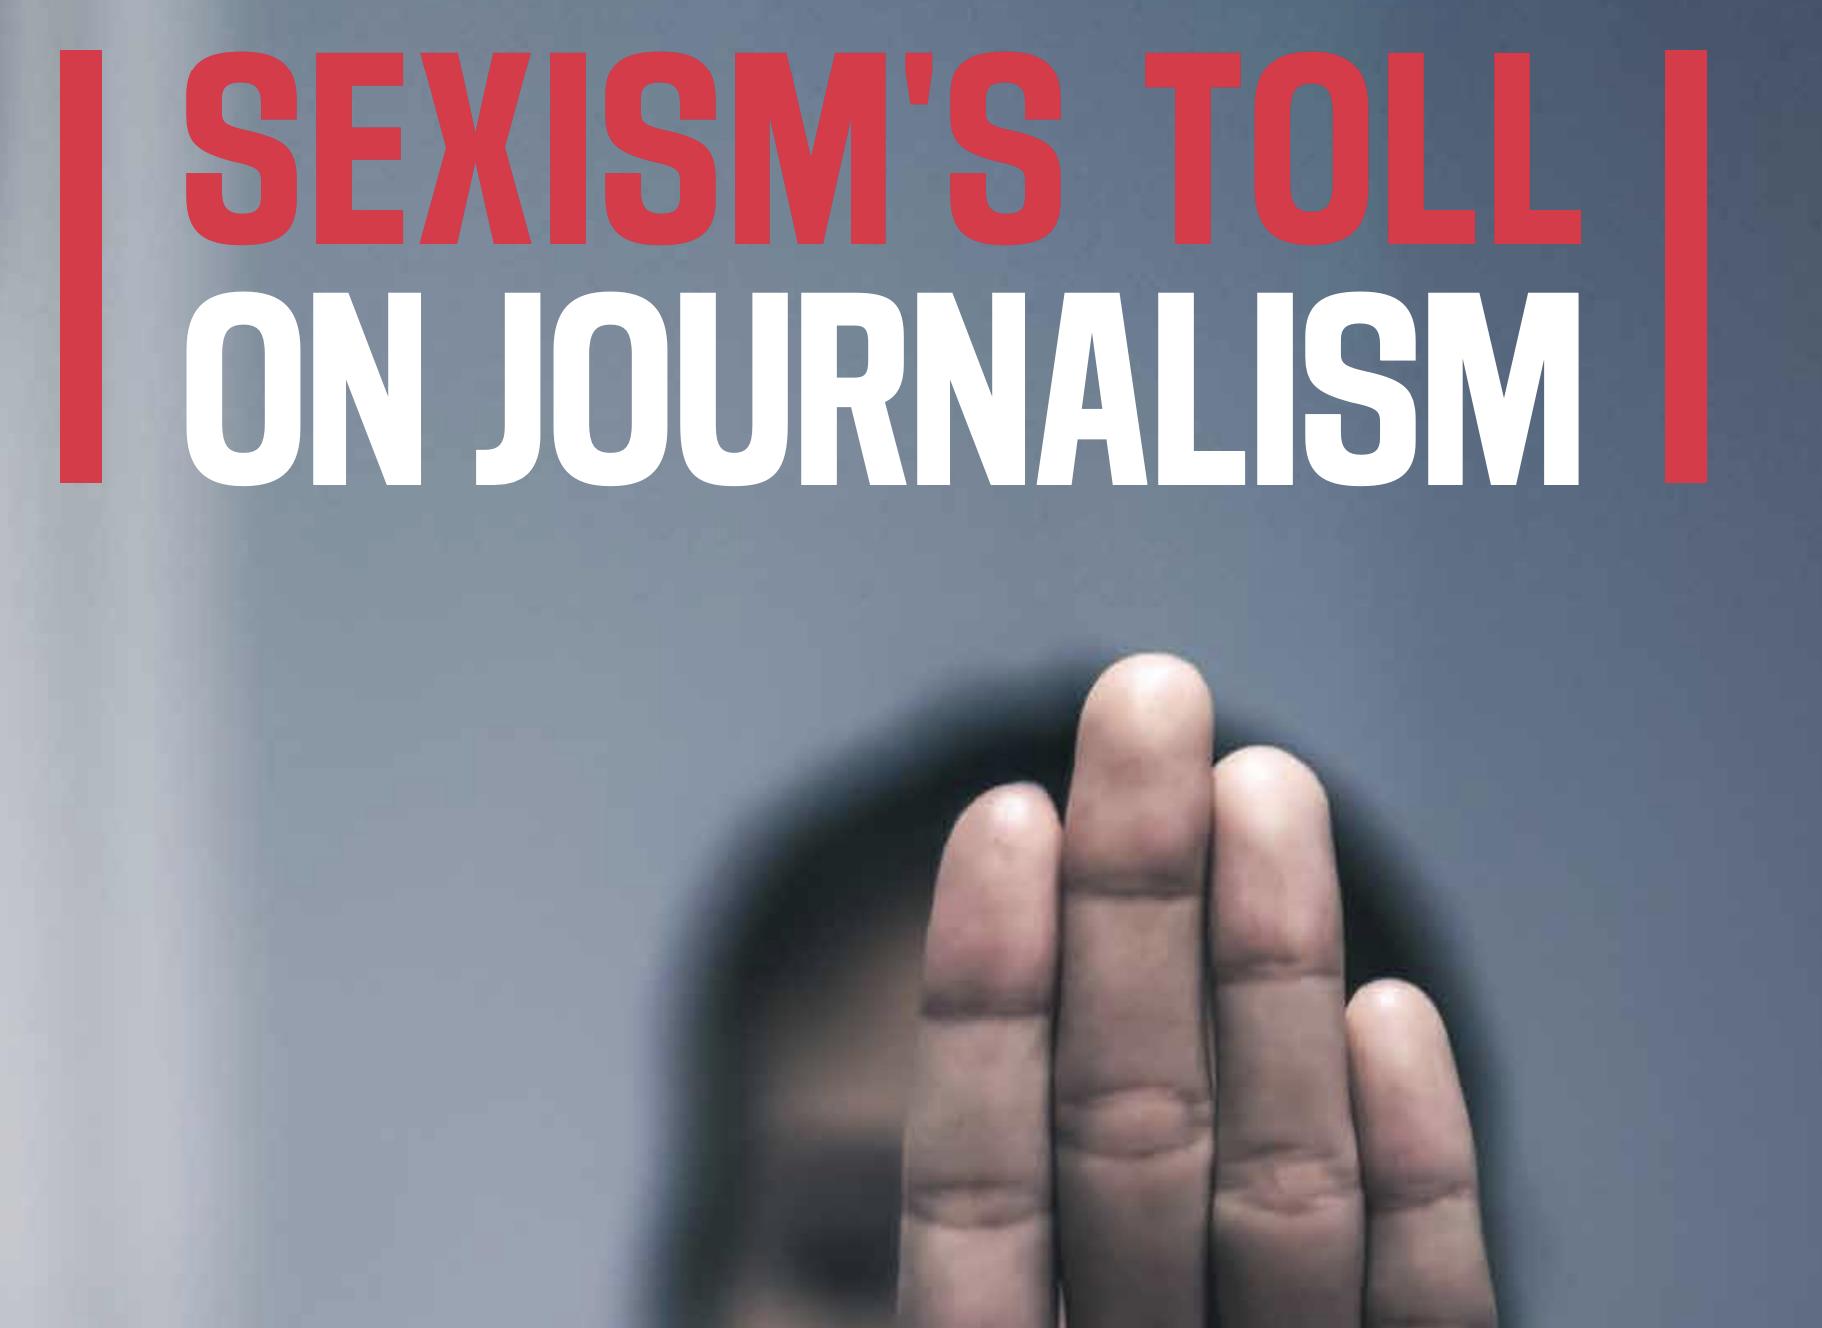 RSF: Ο σεξισμός χτυπά όλο και περισσότερο τη δημοσιογραφία (έρευνα)